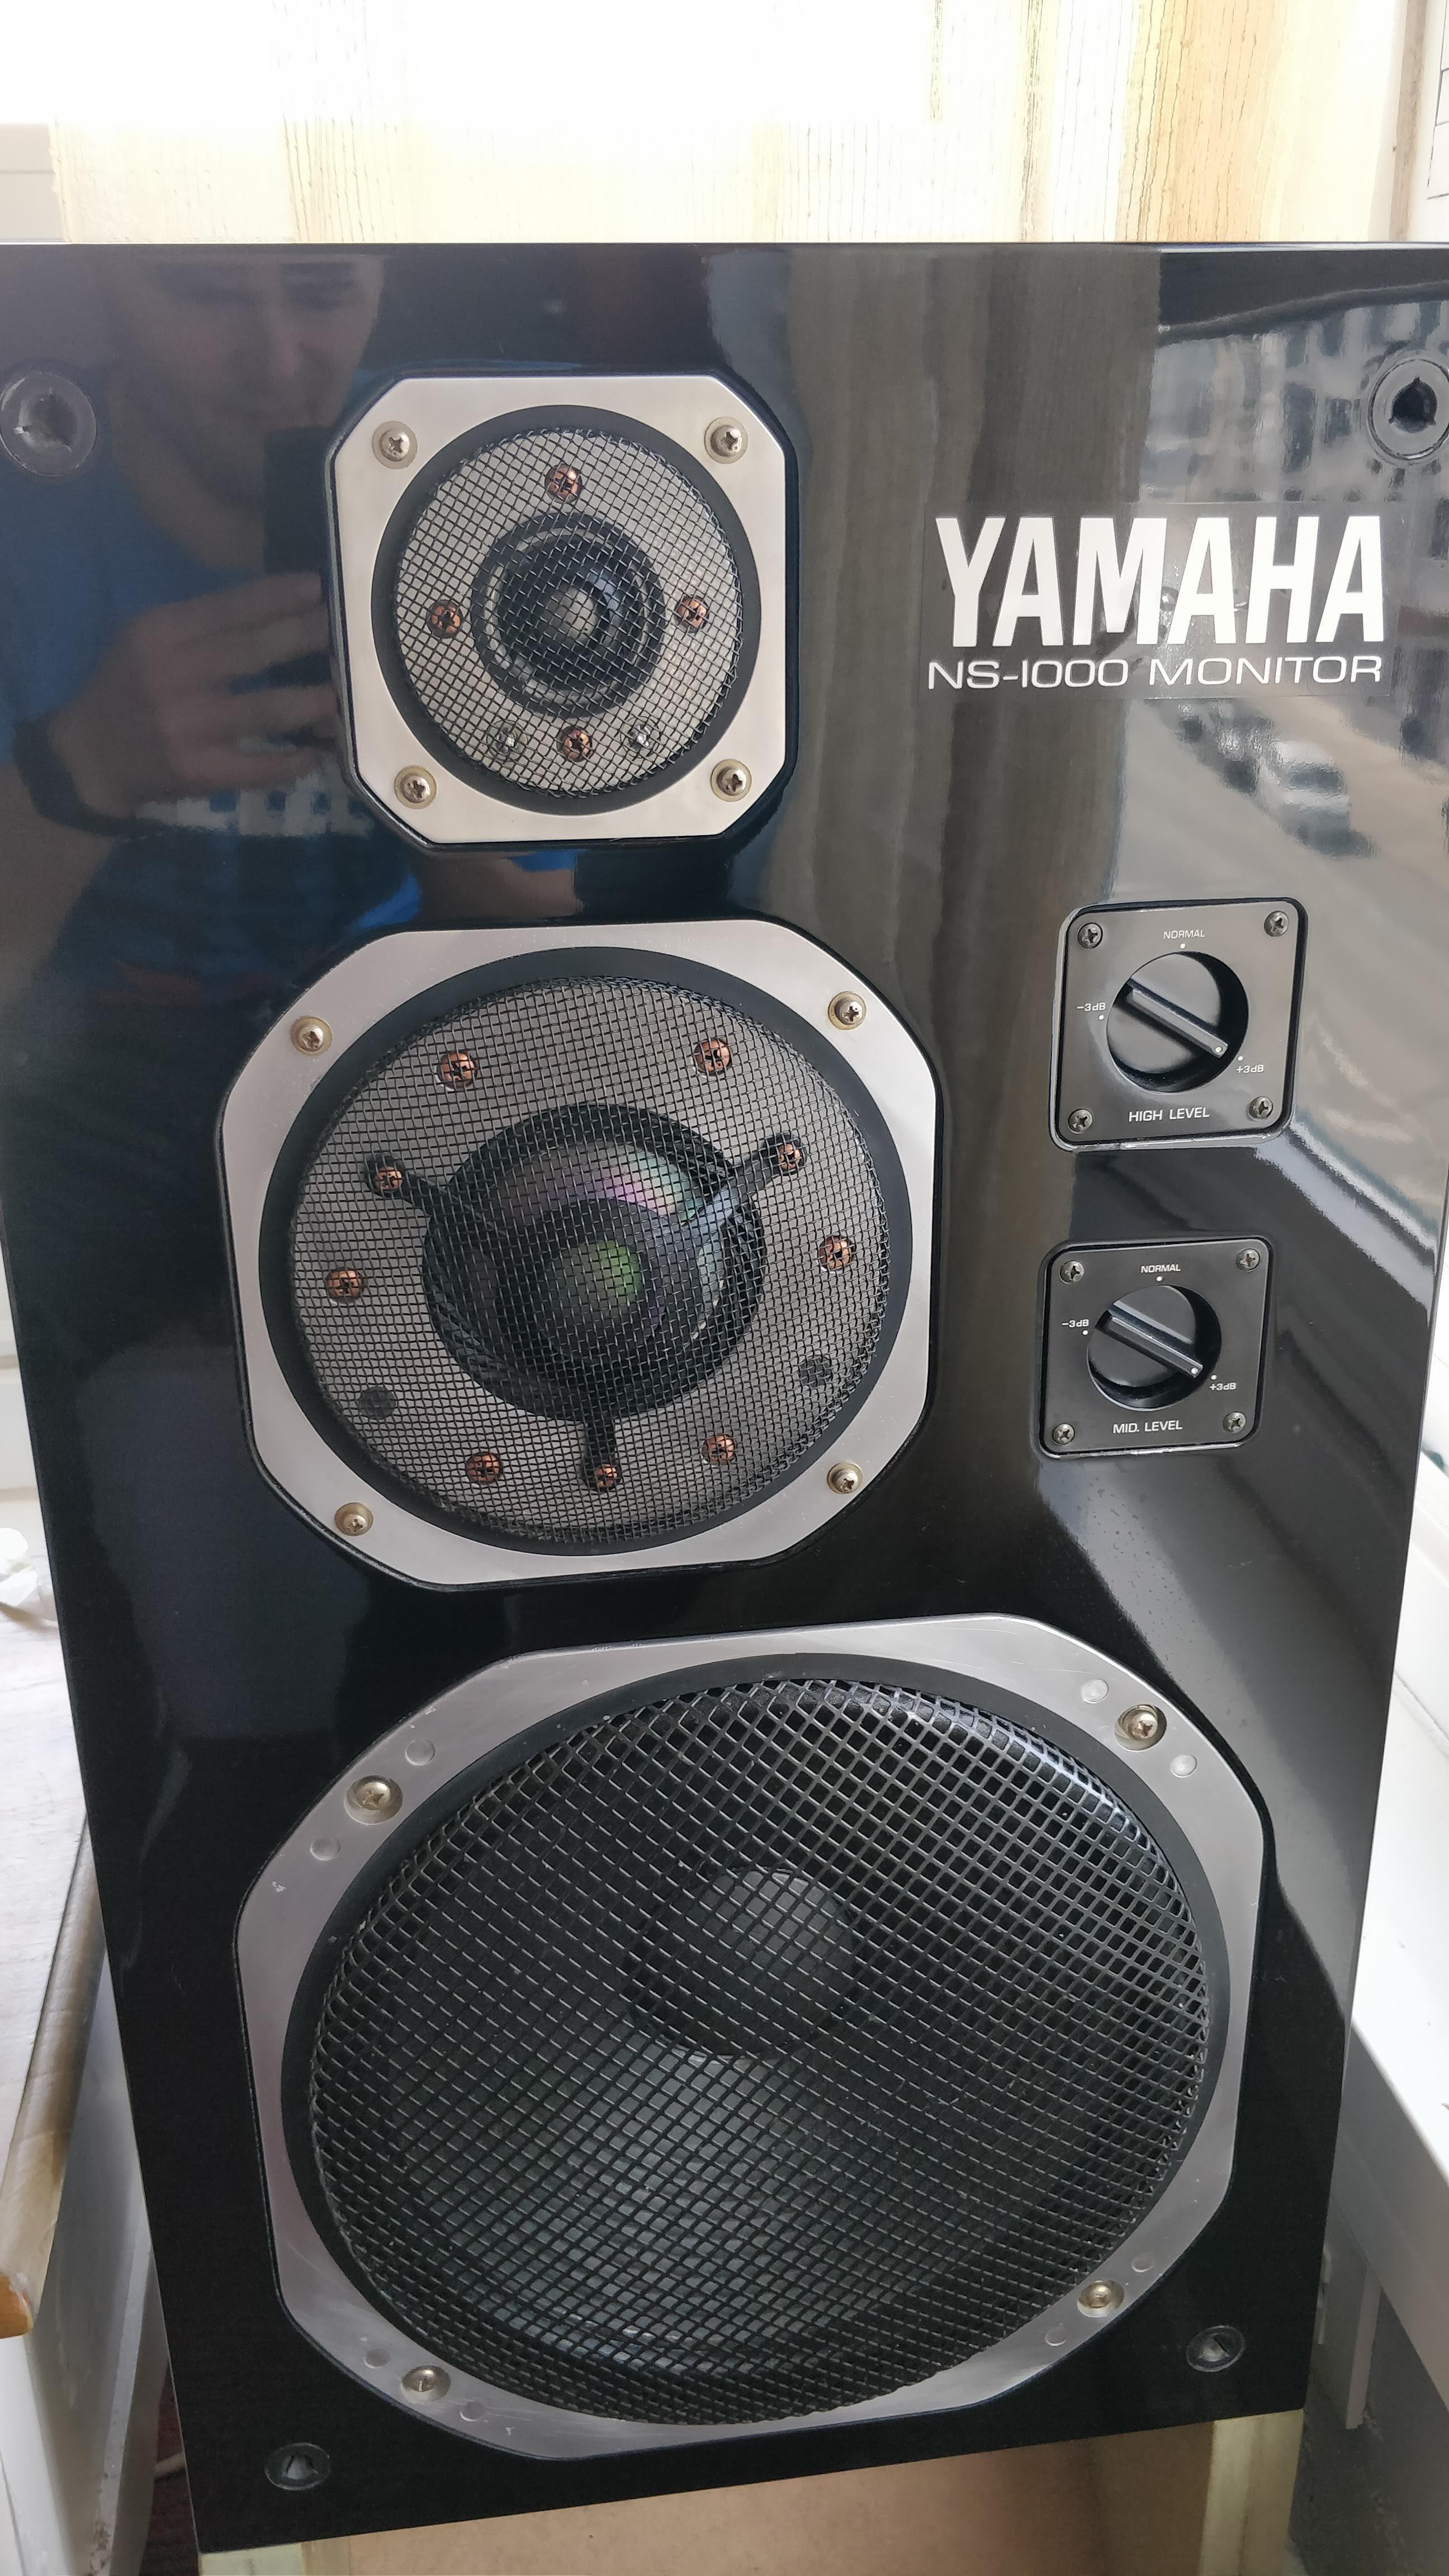 Restauracion Yamaha NS-1000m - Página 2 Evoxjk0